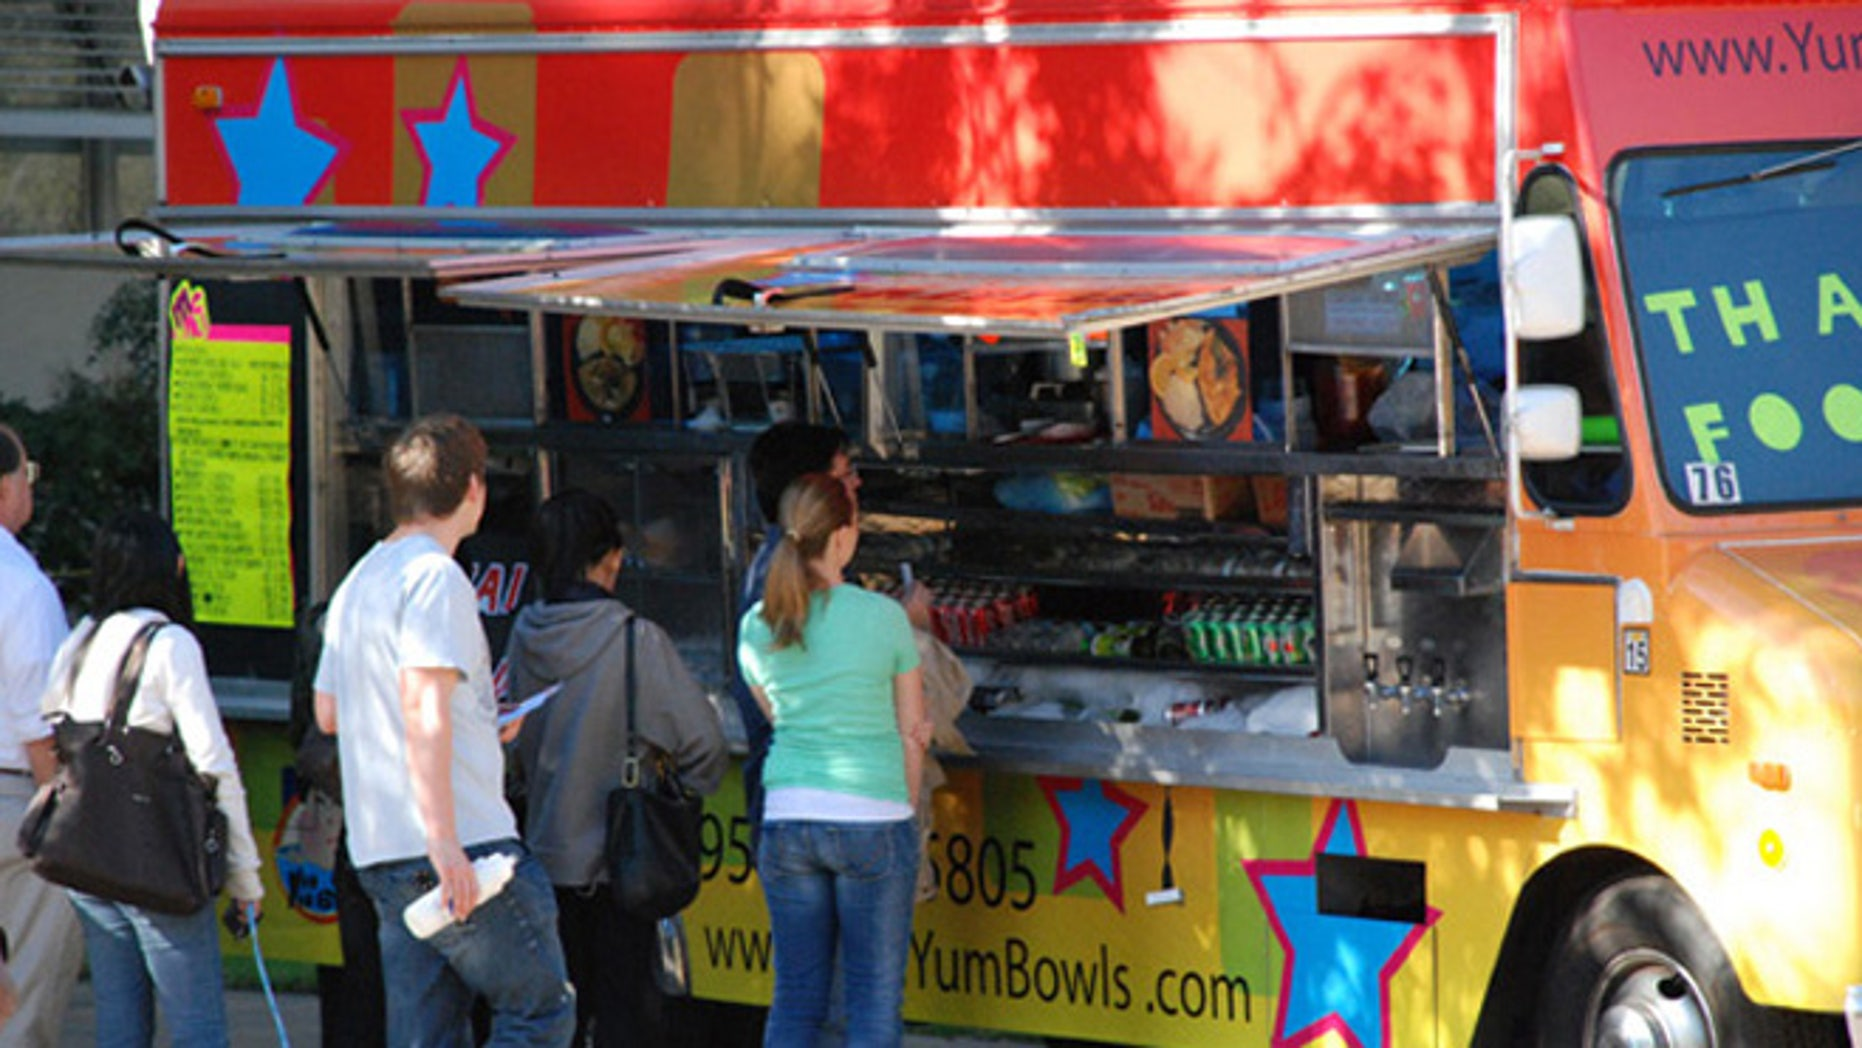 The Thai-fusion Yum Yum Bowls food truck at UCLA.